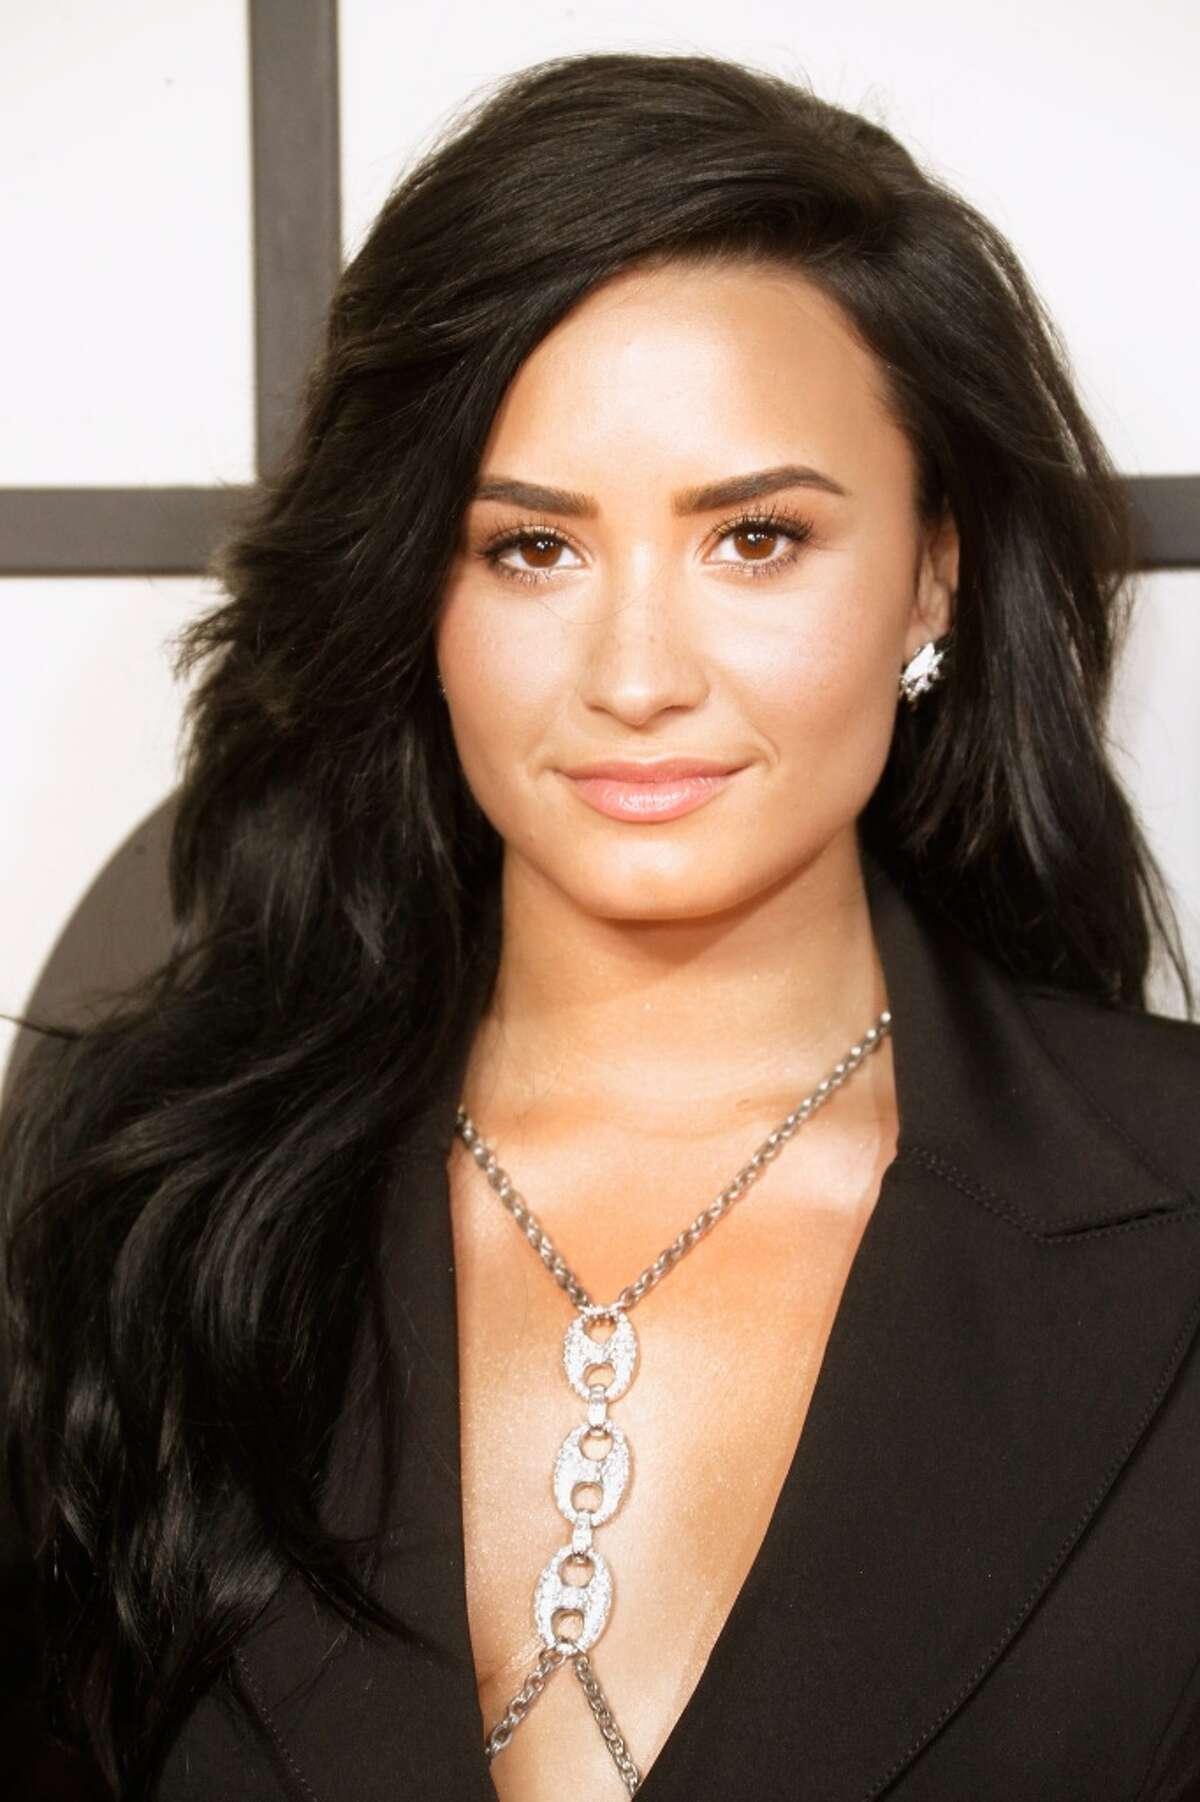 (Demi) Lovato 18,114thmost common Highest density in:El salvador Source:Forebears.io